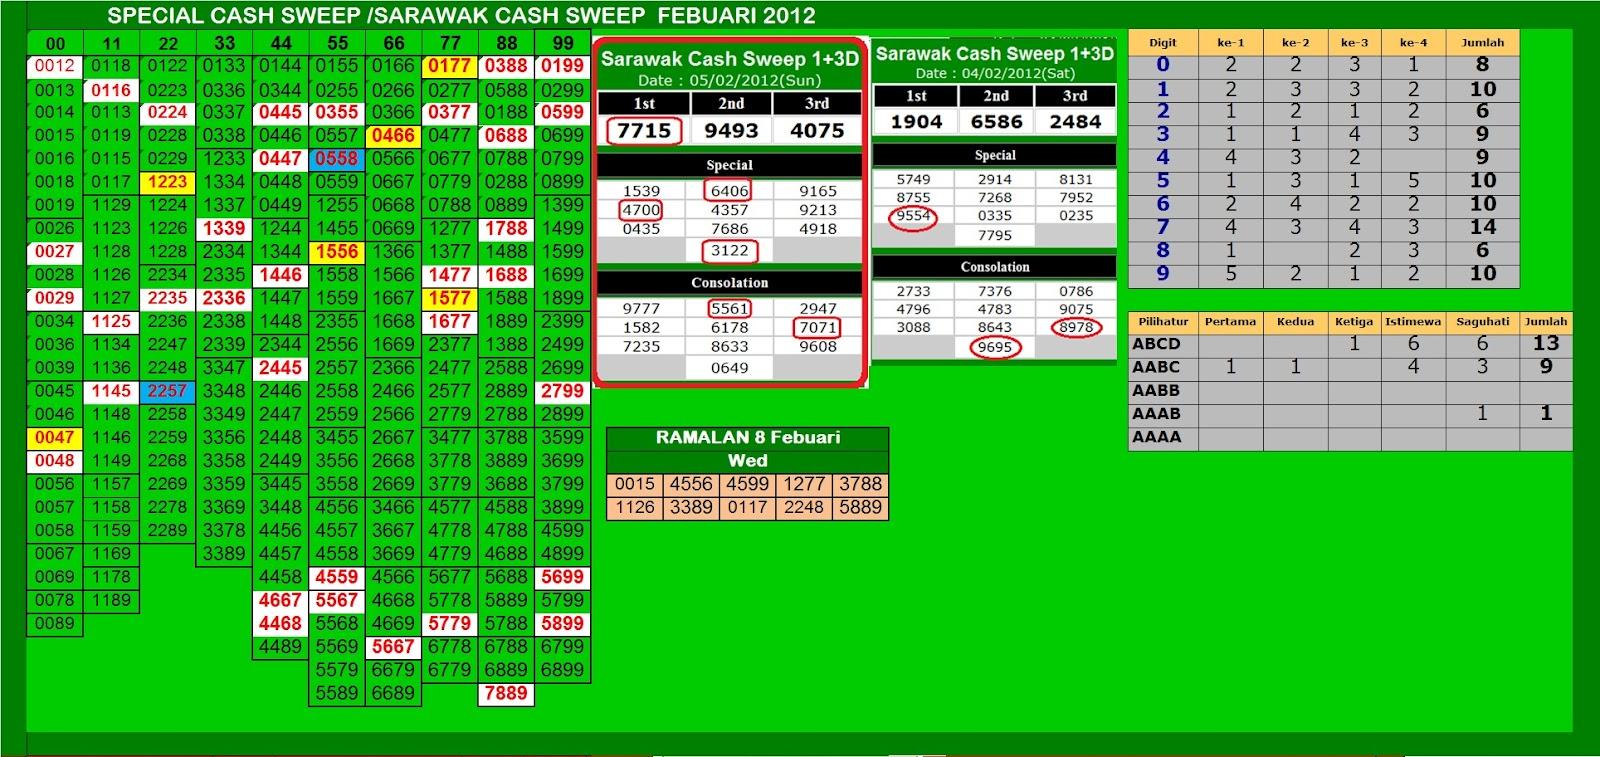 sarawak cash sweep 8 feb